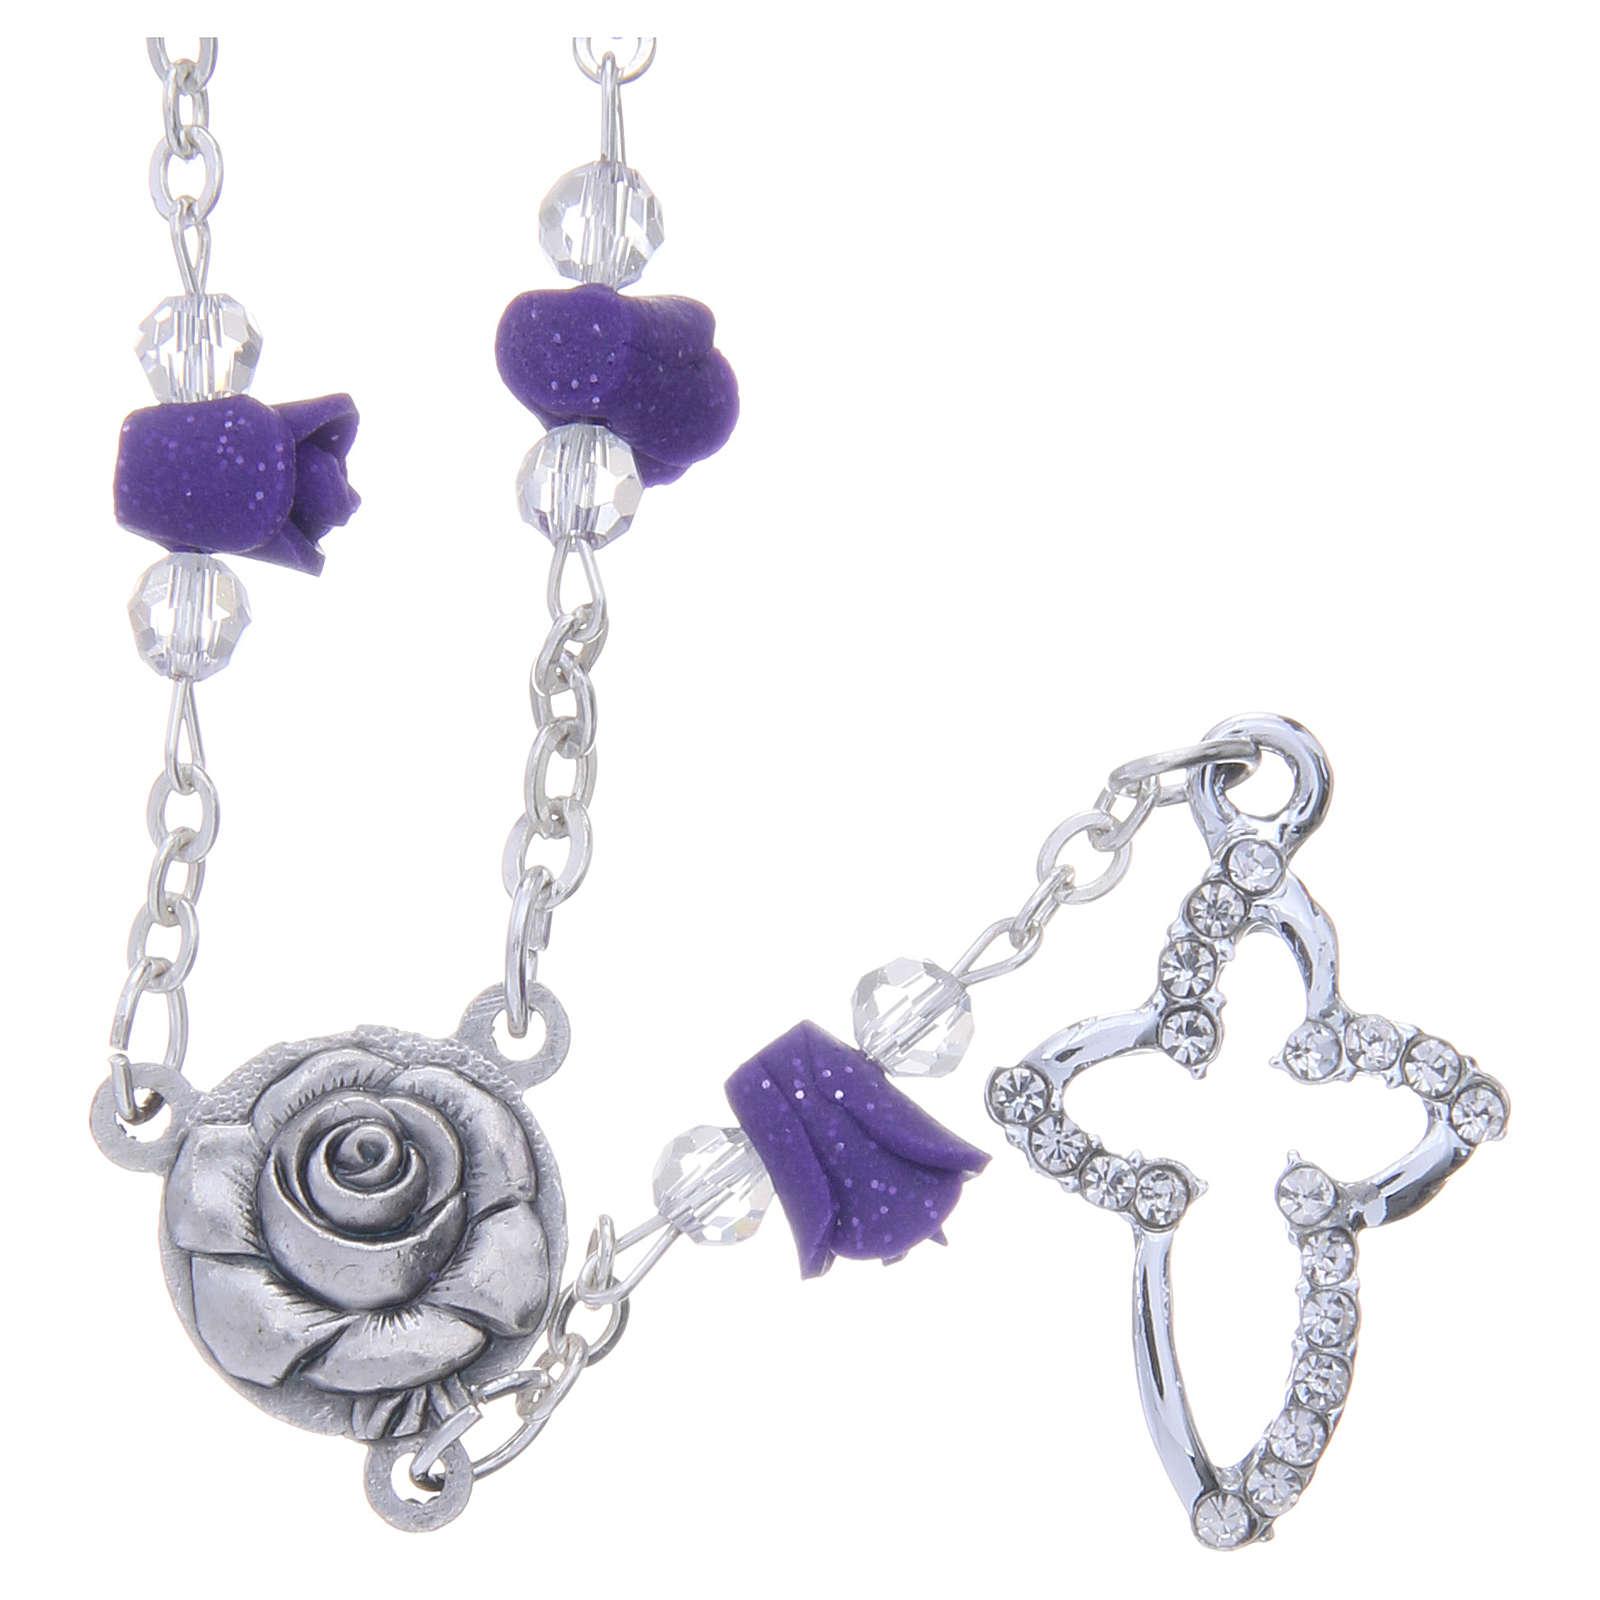 Collana rosario Medjugorje rose ceramica viola e grani 4